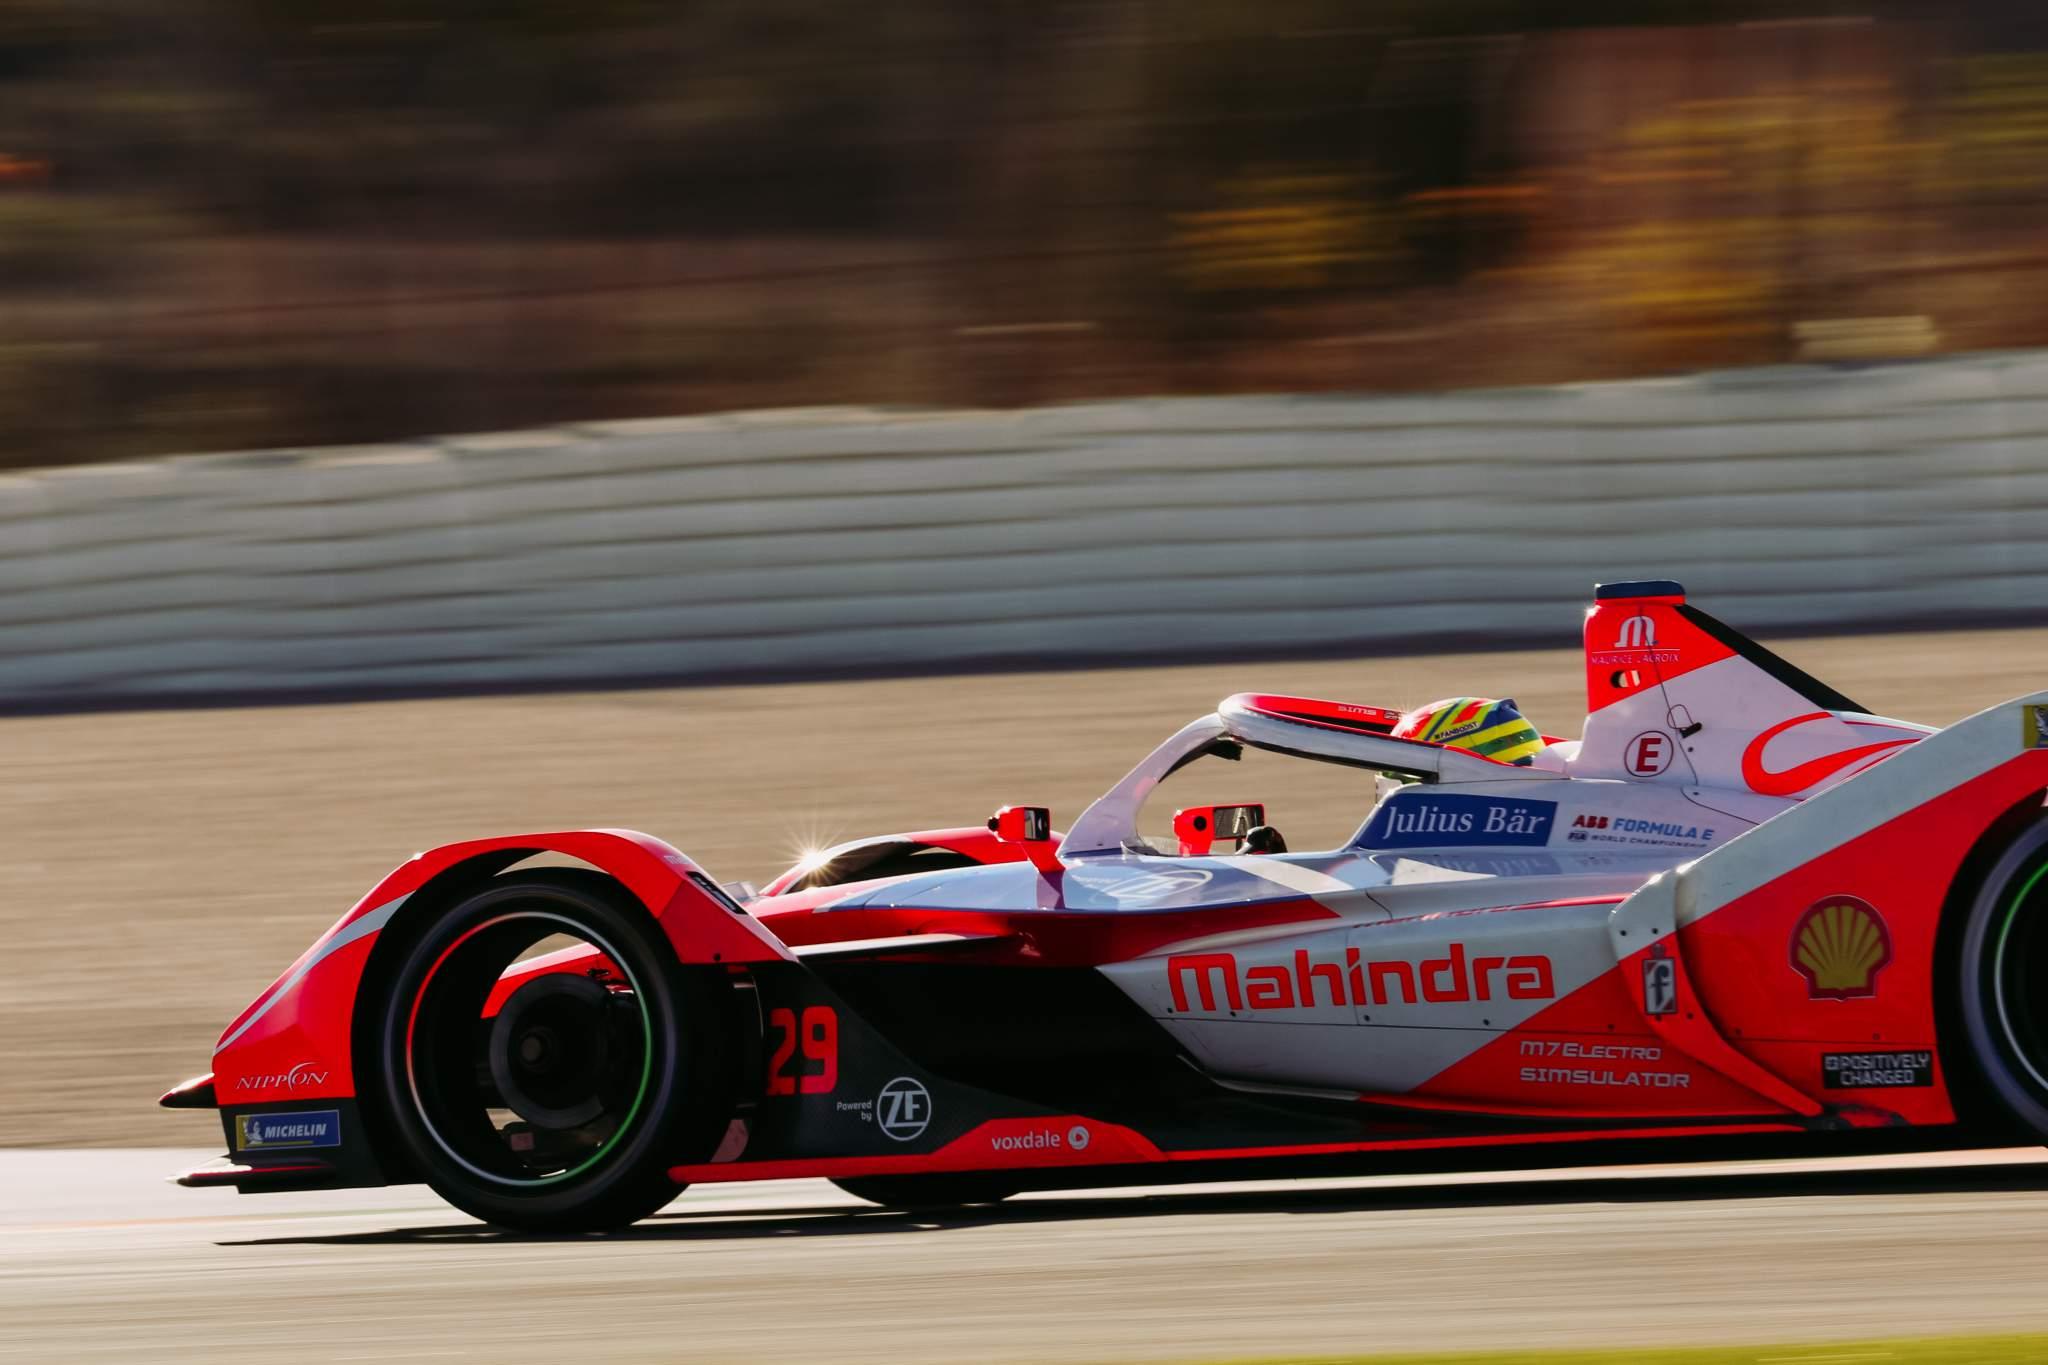 Alexander Sims Mahindra Valencia Formula E testing 2020